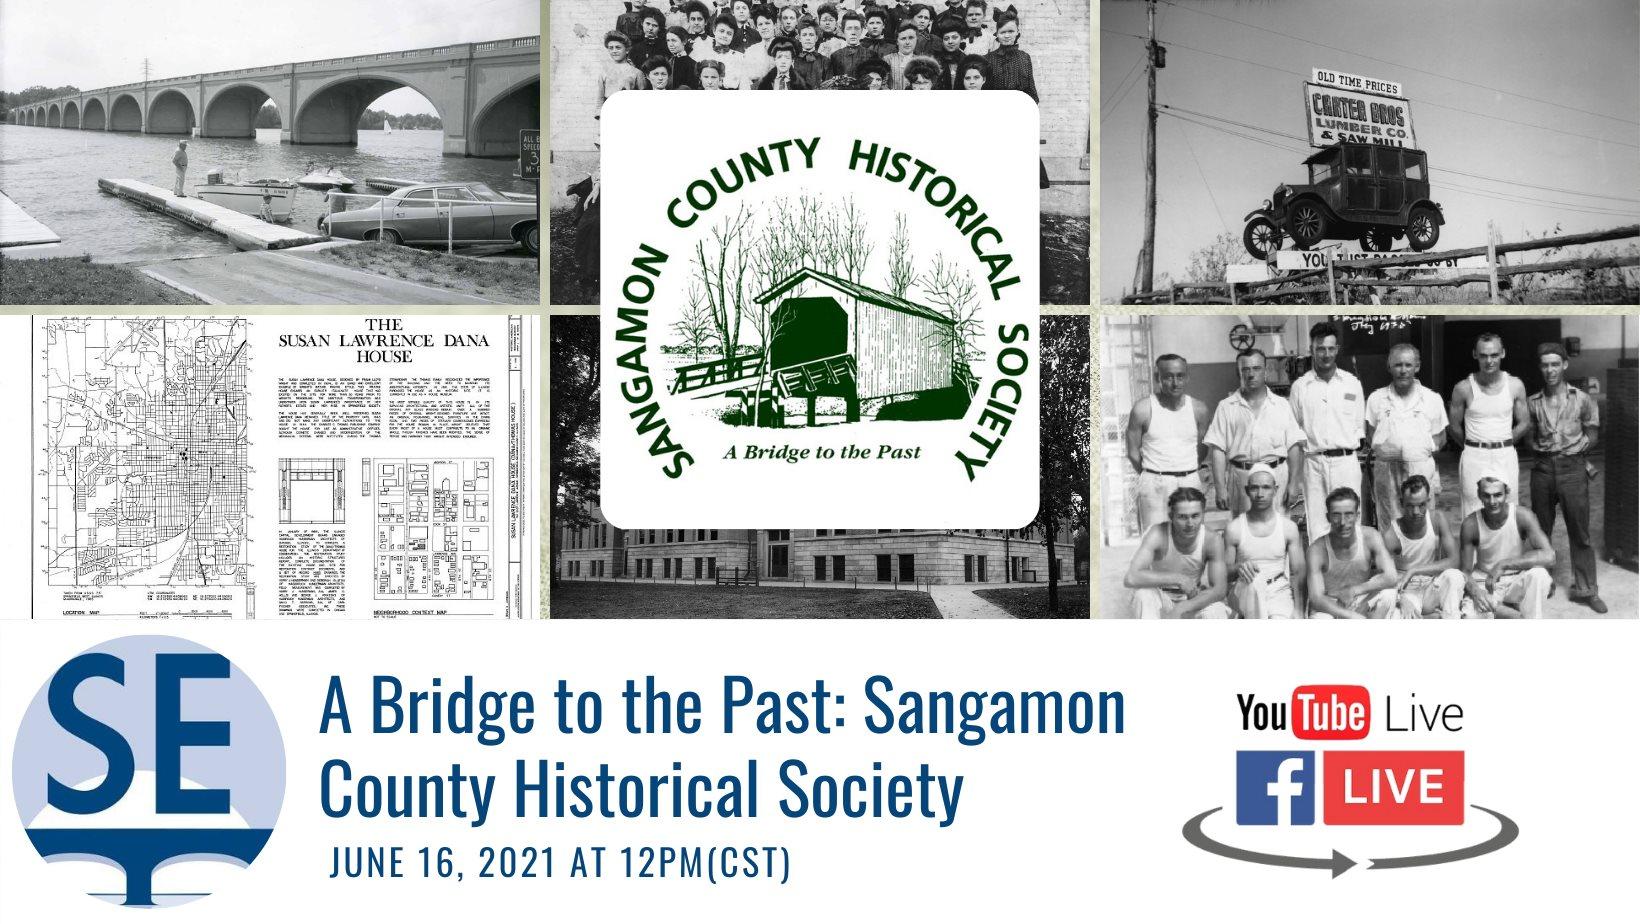 A Bridge to the Past: Sangamon Historical Society